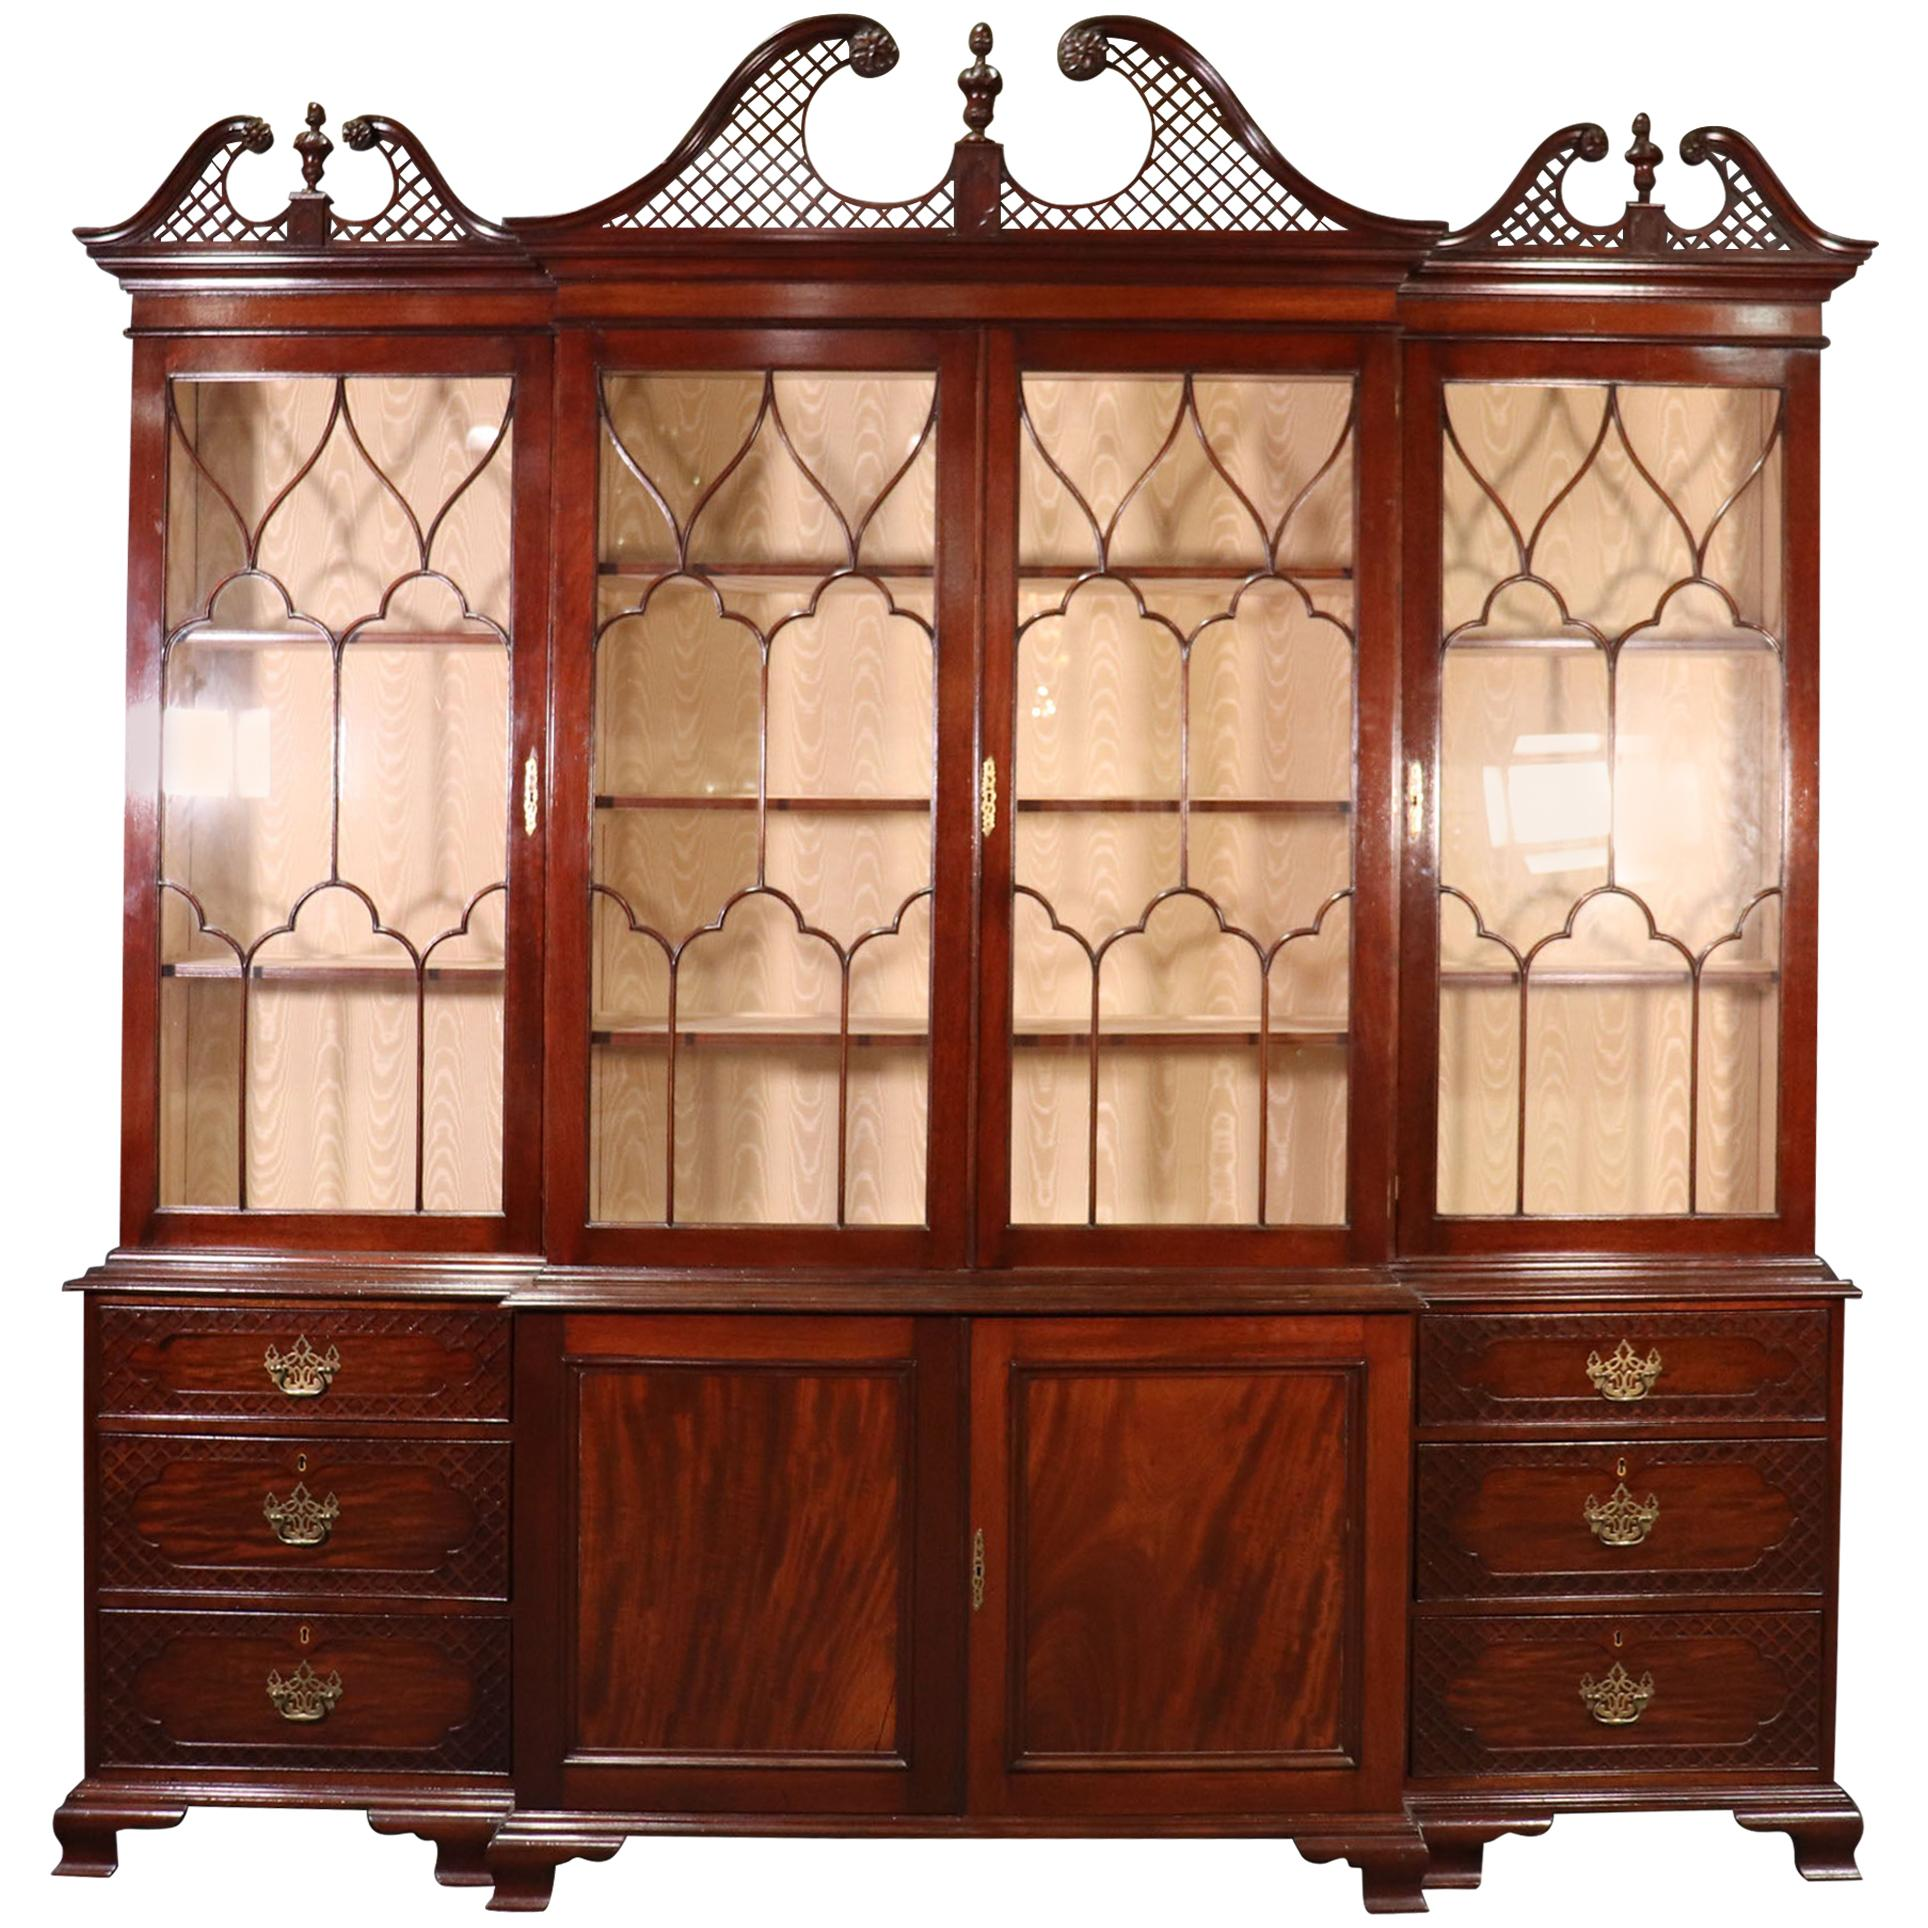 Solid Mahogany Sheraton Style Custom Made Multi Sectional Breakfront Bookcase